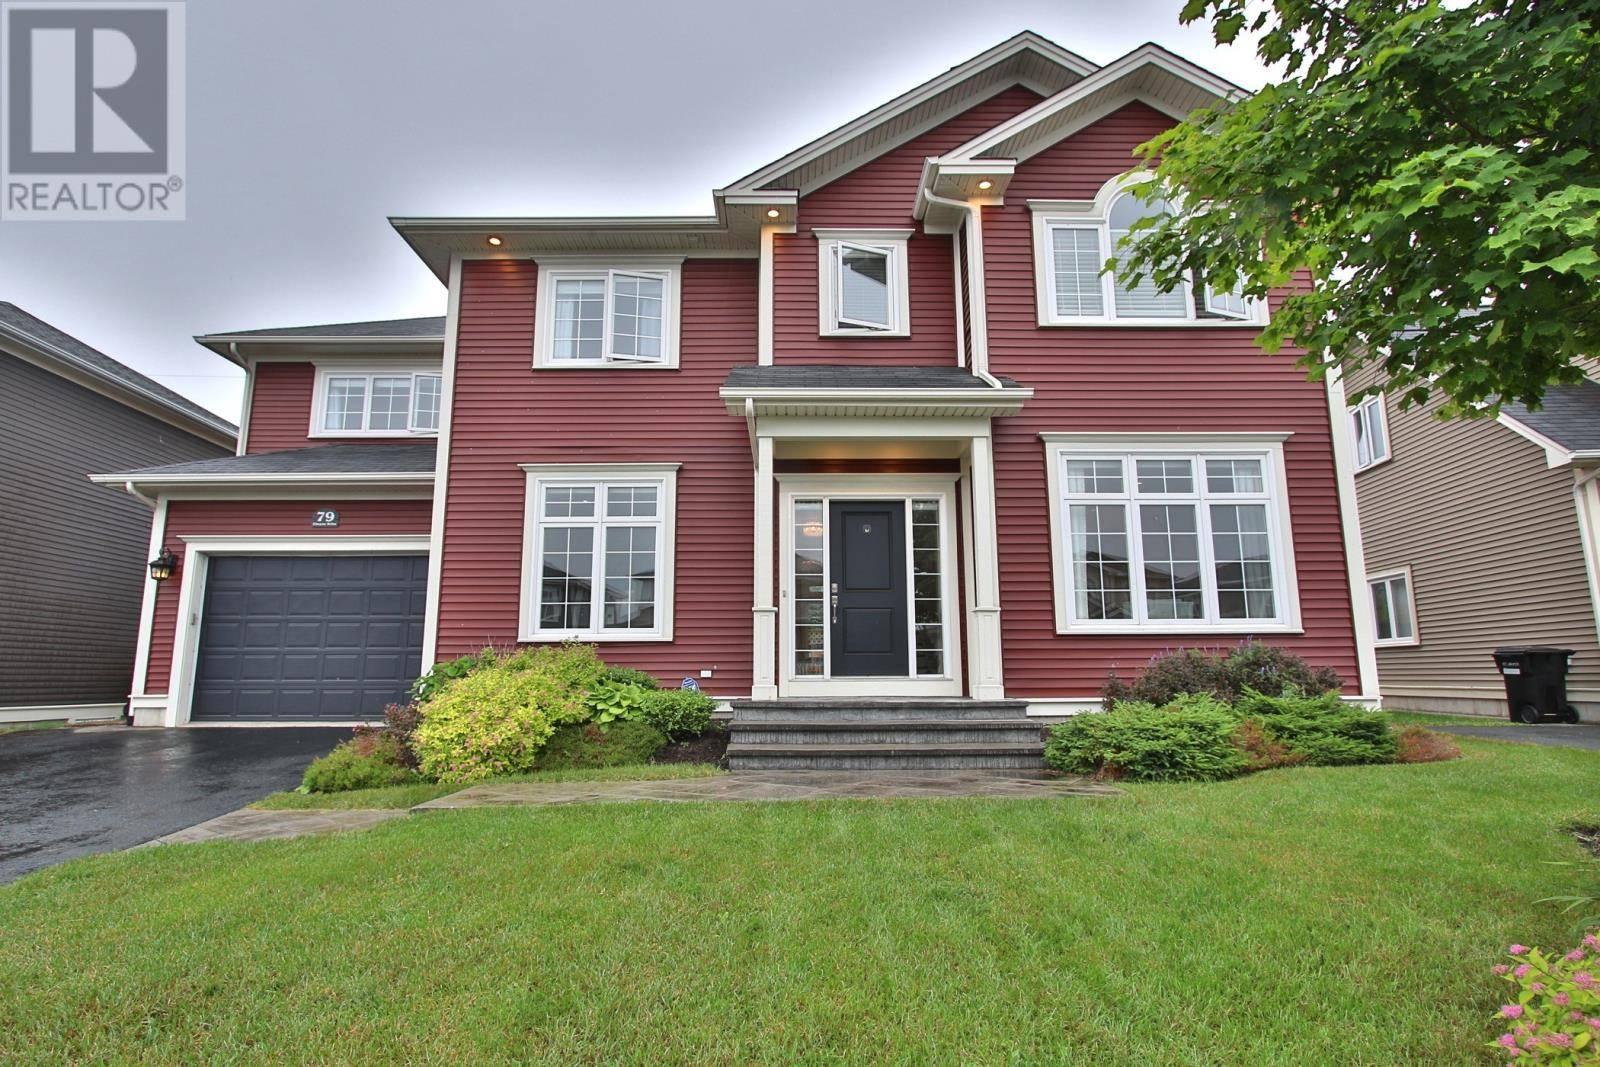 House for sale at 79 Cheyne Dr St. John's Newfoundland - MLS: 1200401